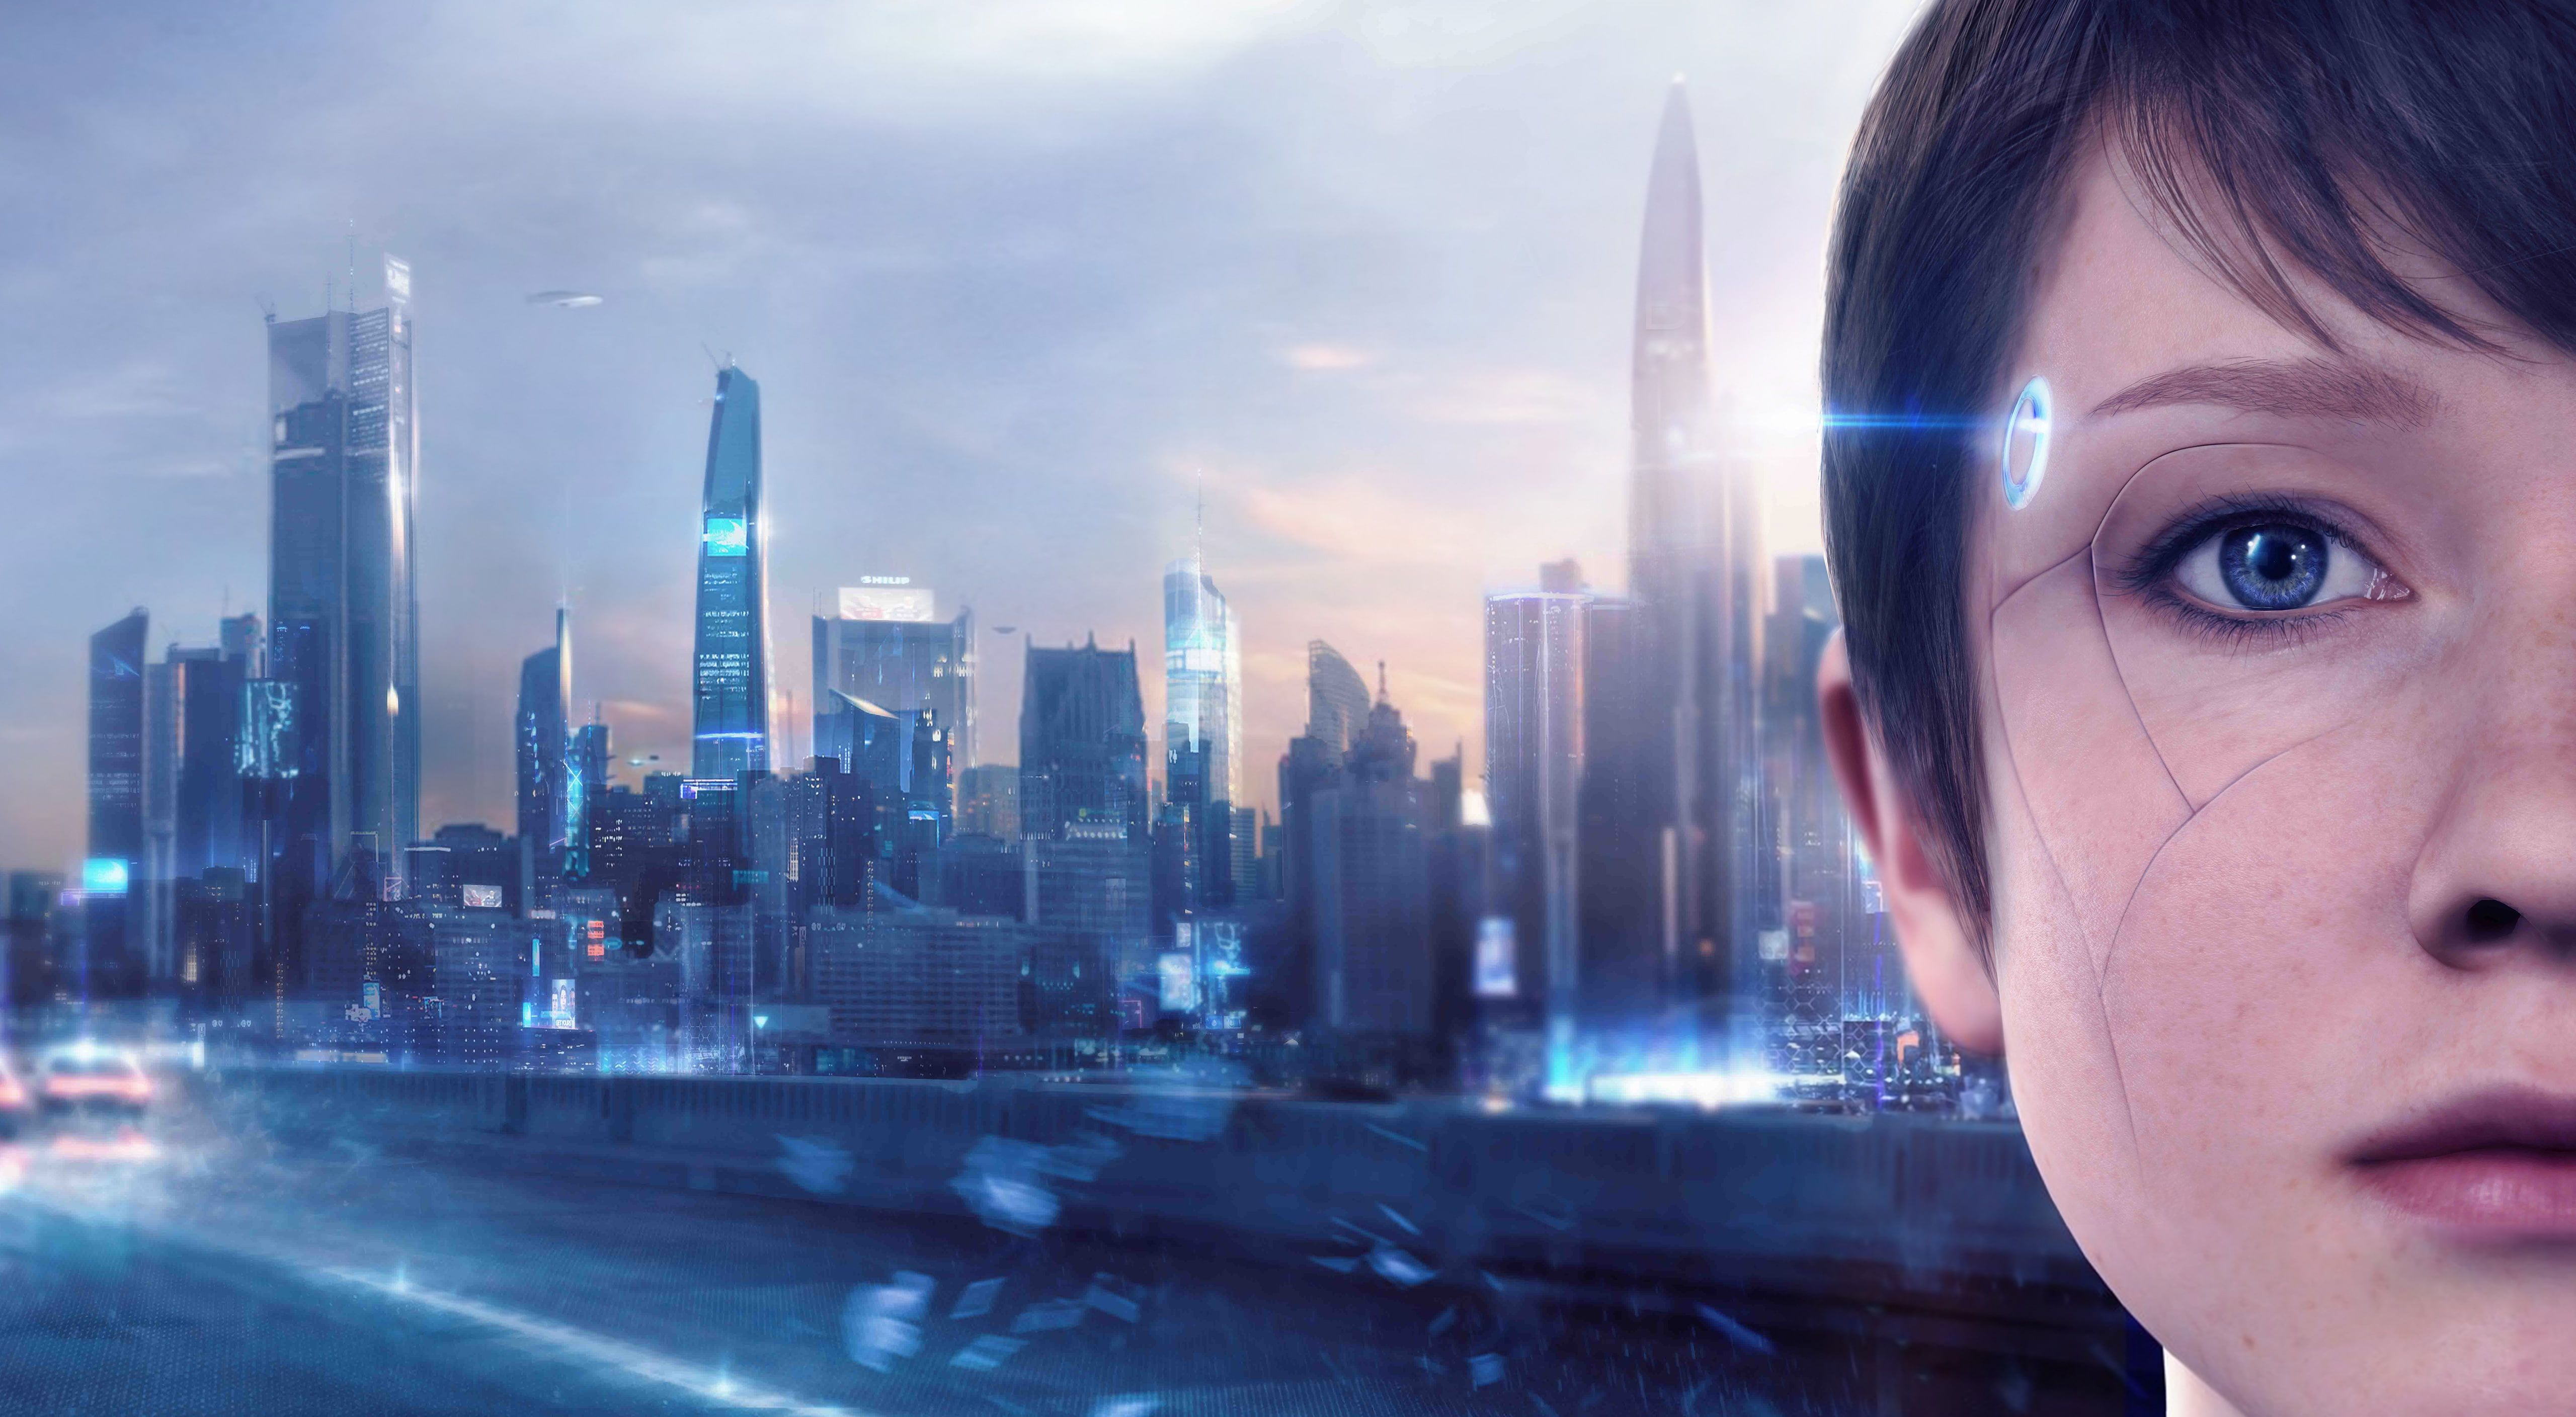 Detroit Become Human 2018 Games Hd Games 4k 5k 5k Wallpaper Hdwallpaper Desktop Detroit Become Human Detroit Human